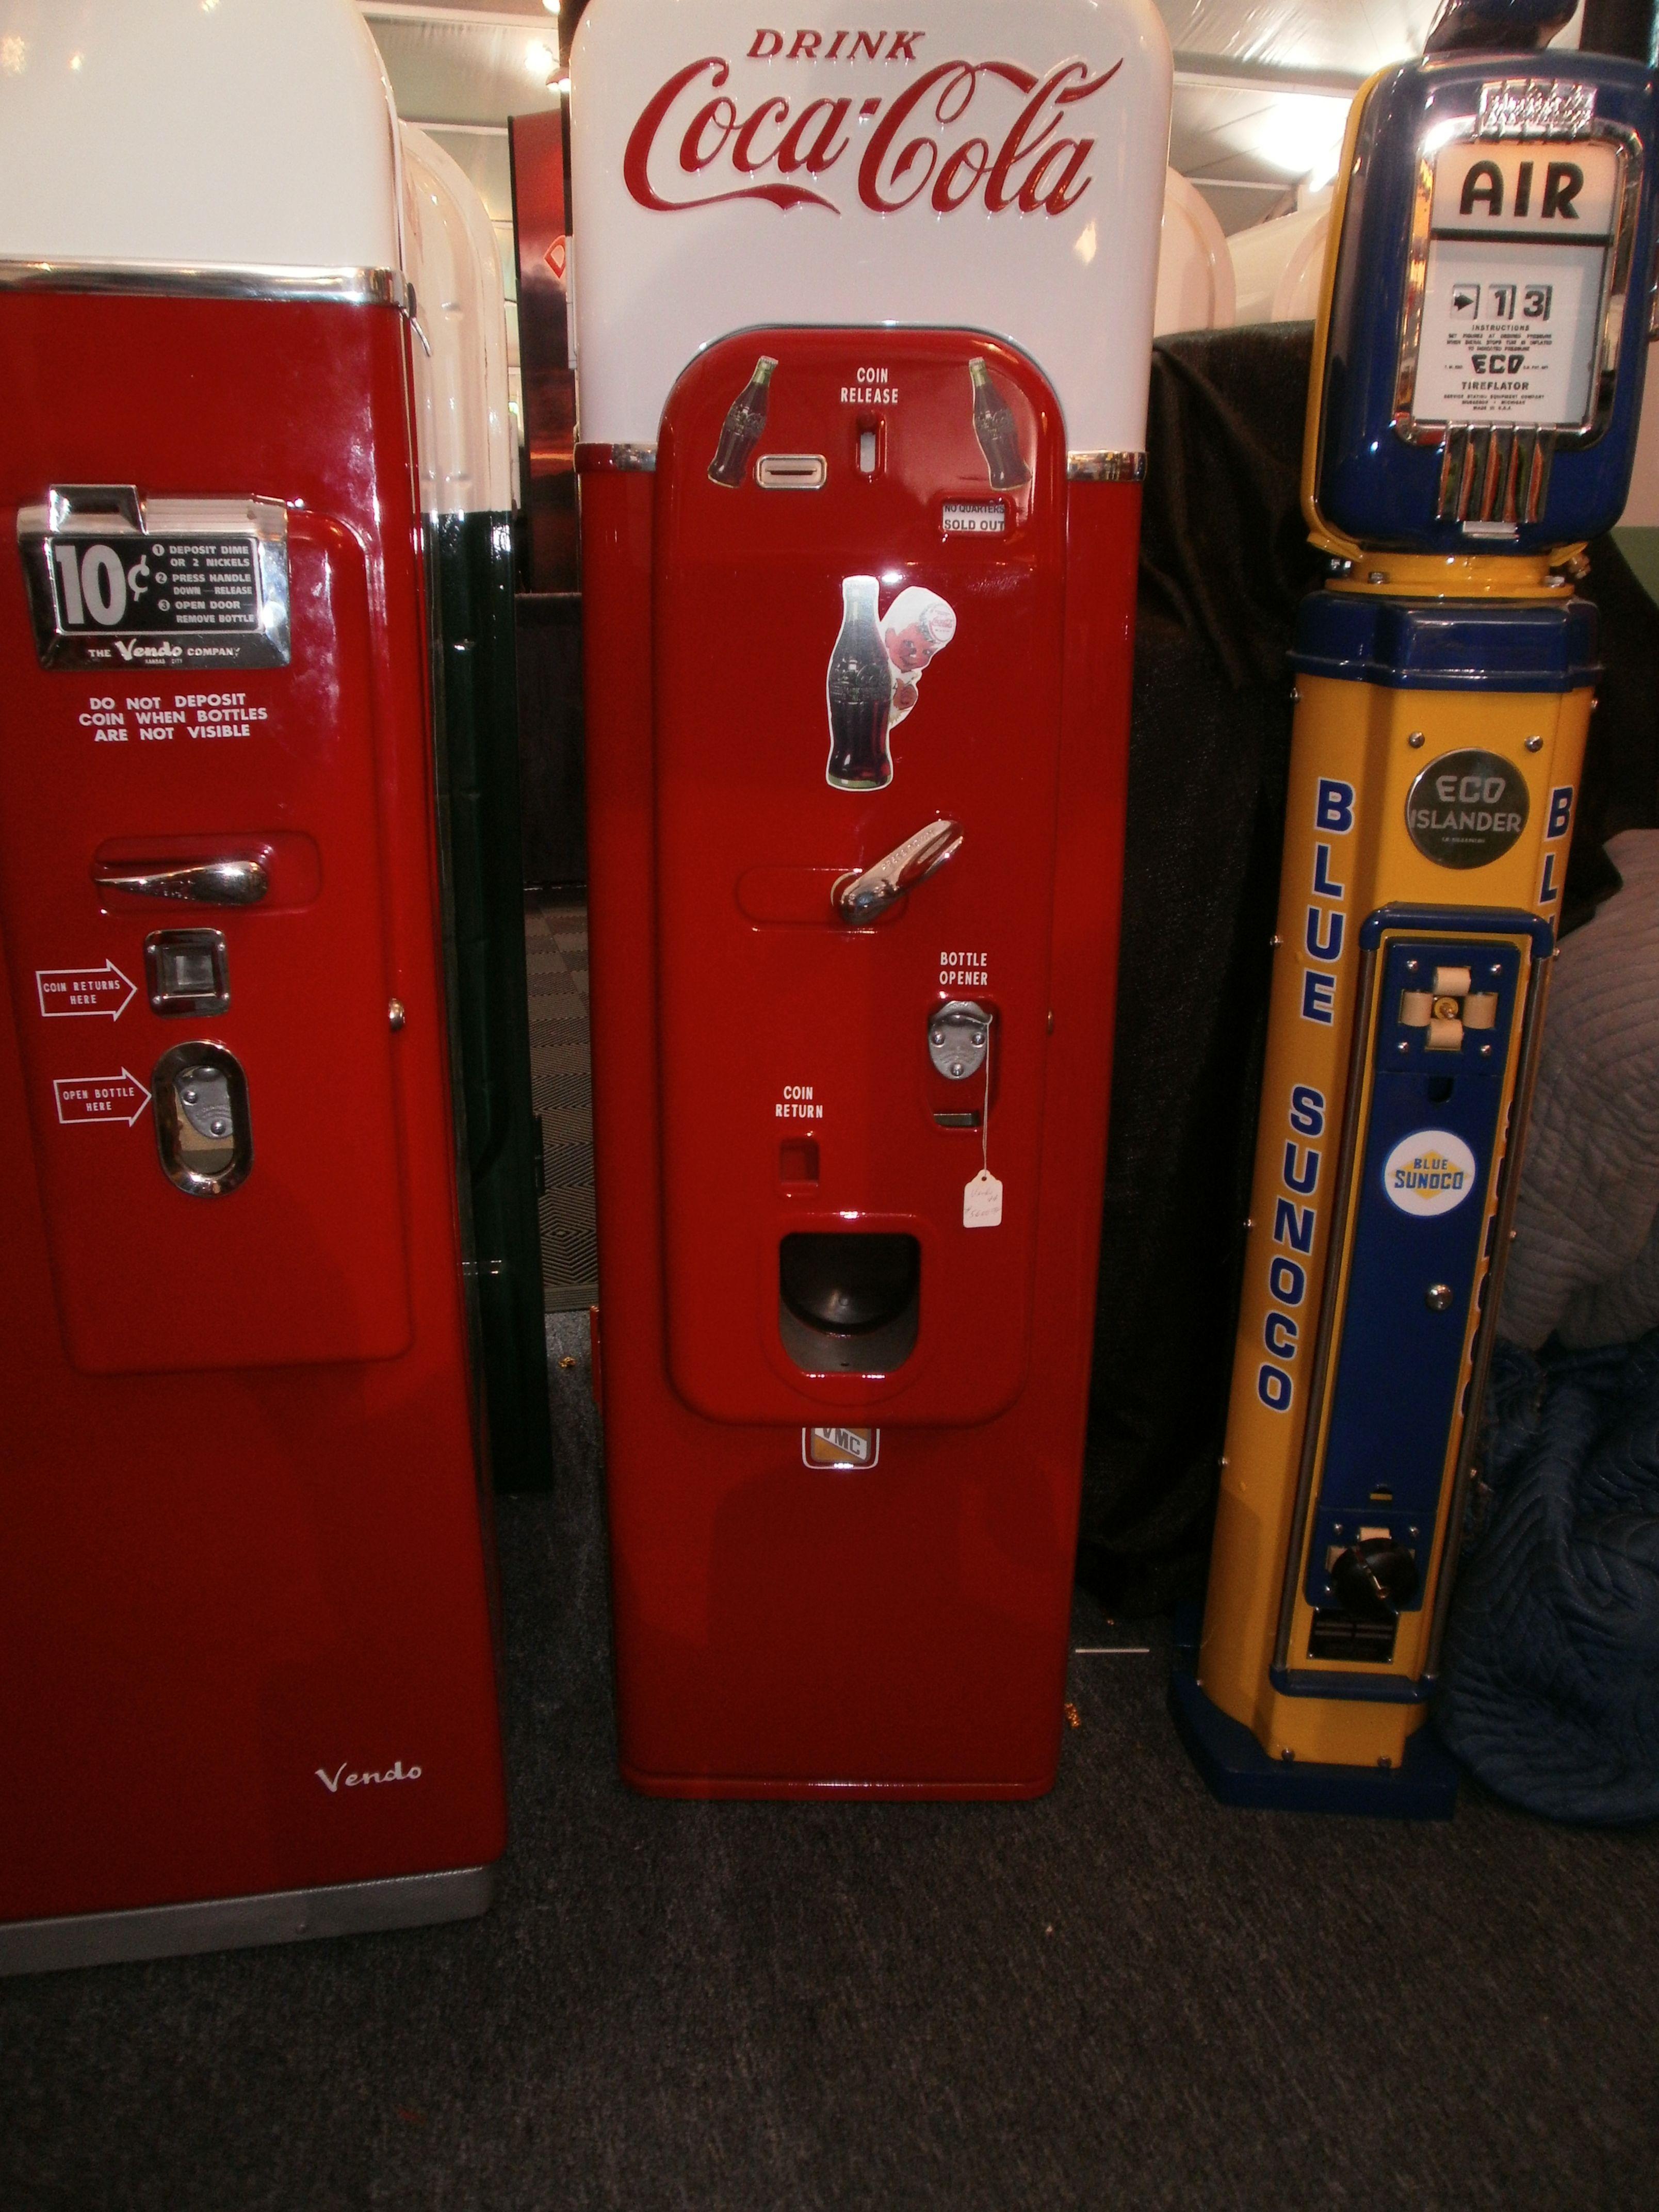 Gas Station, Gas Pumps, Soda, Dream Garage, Coca Cola, Air,